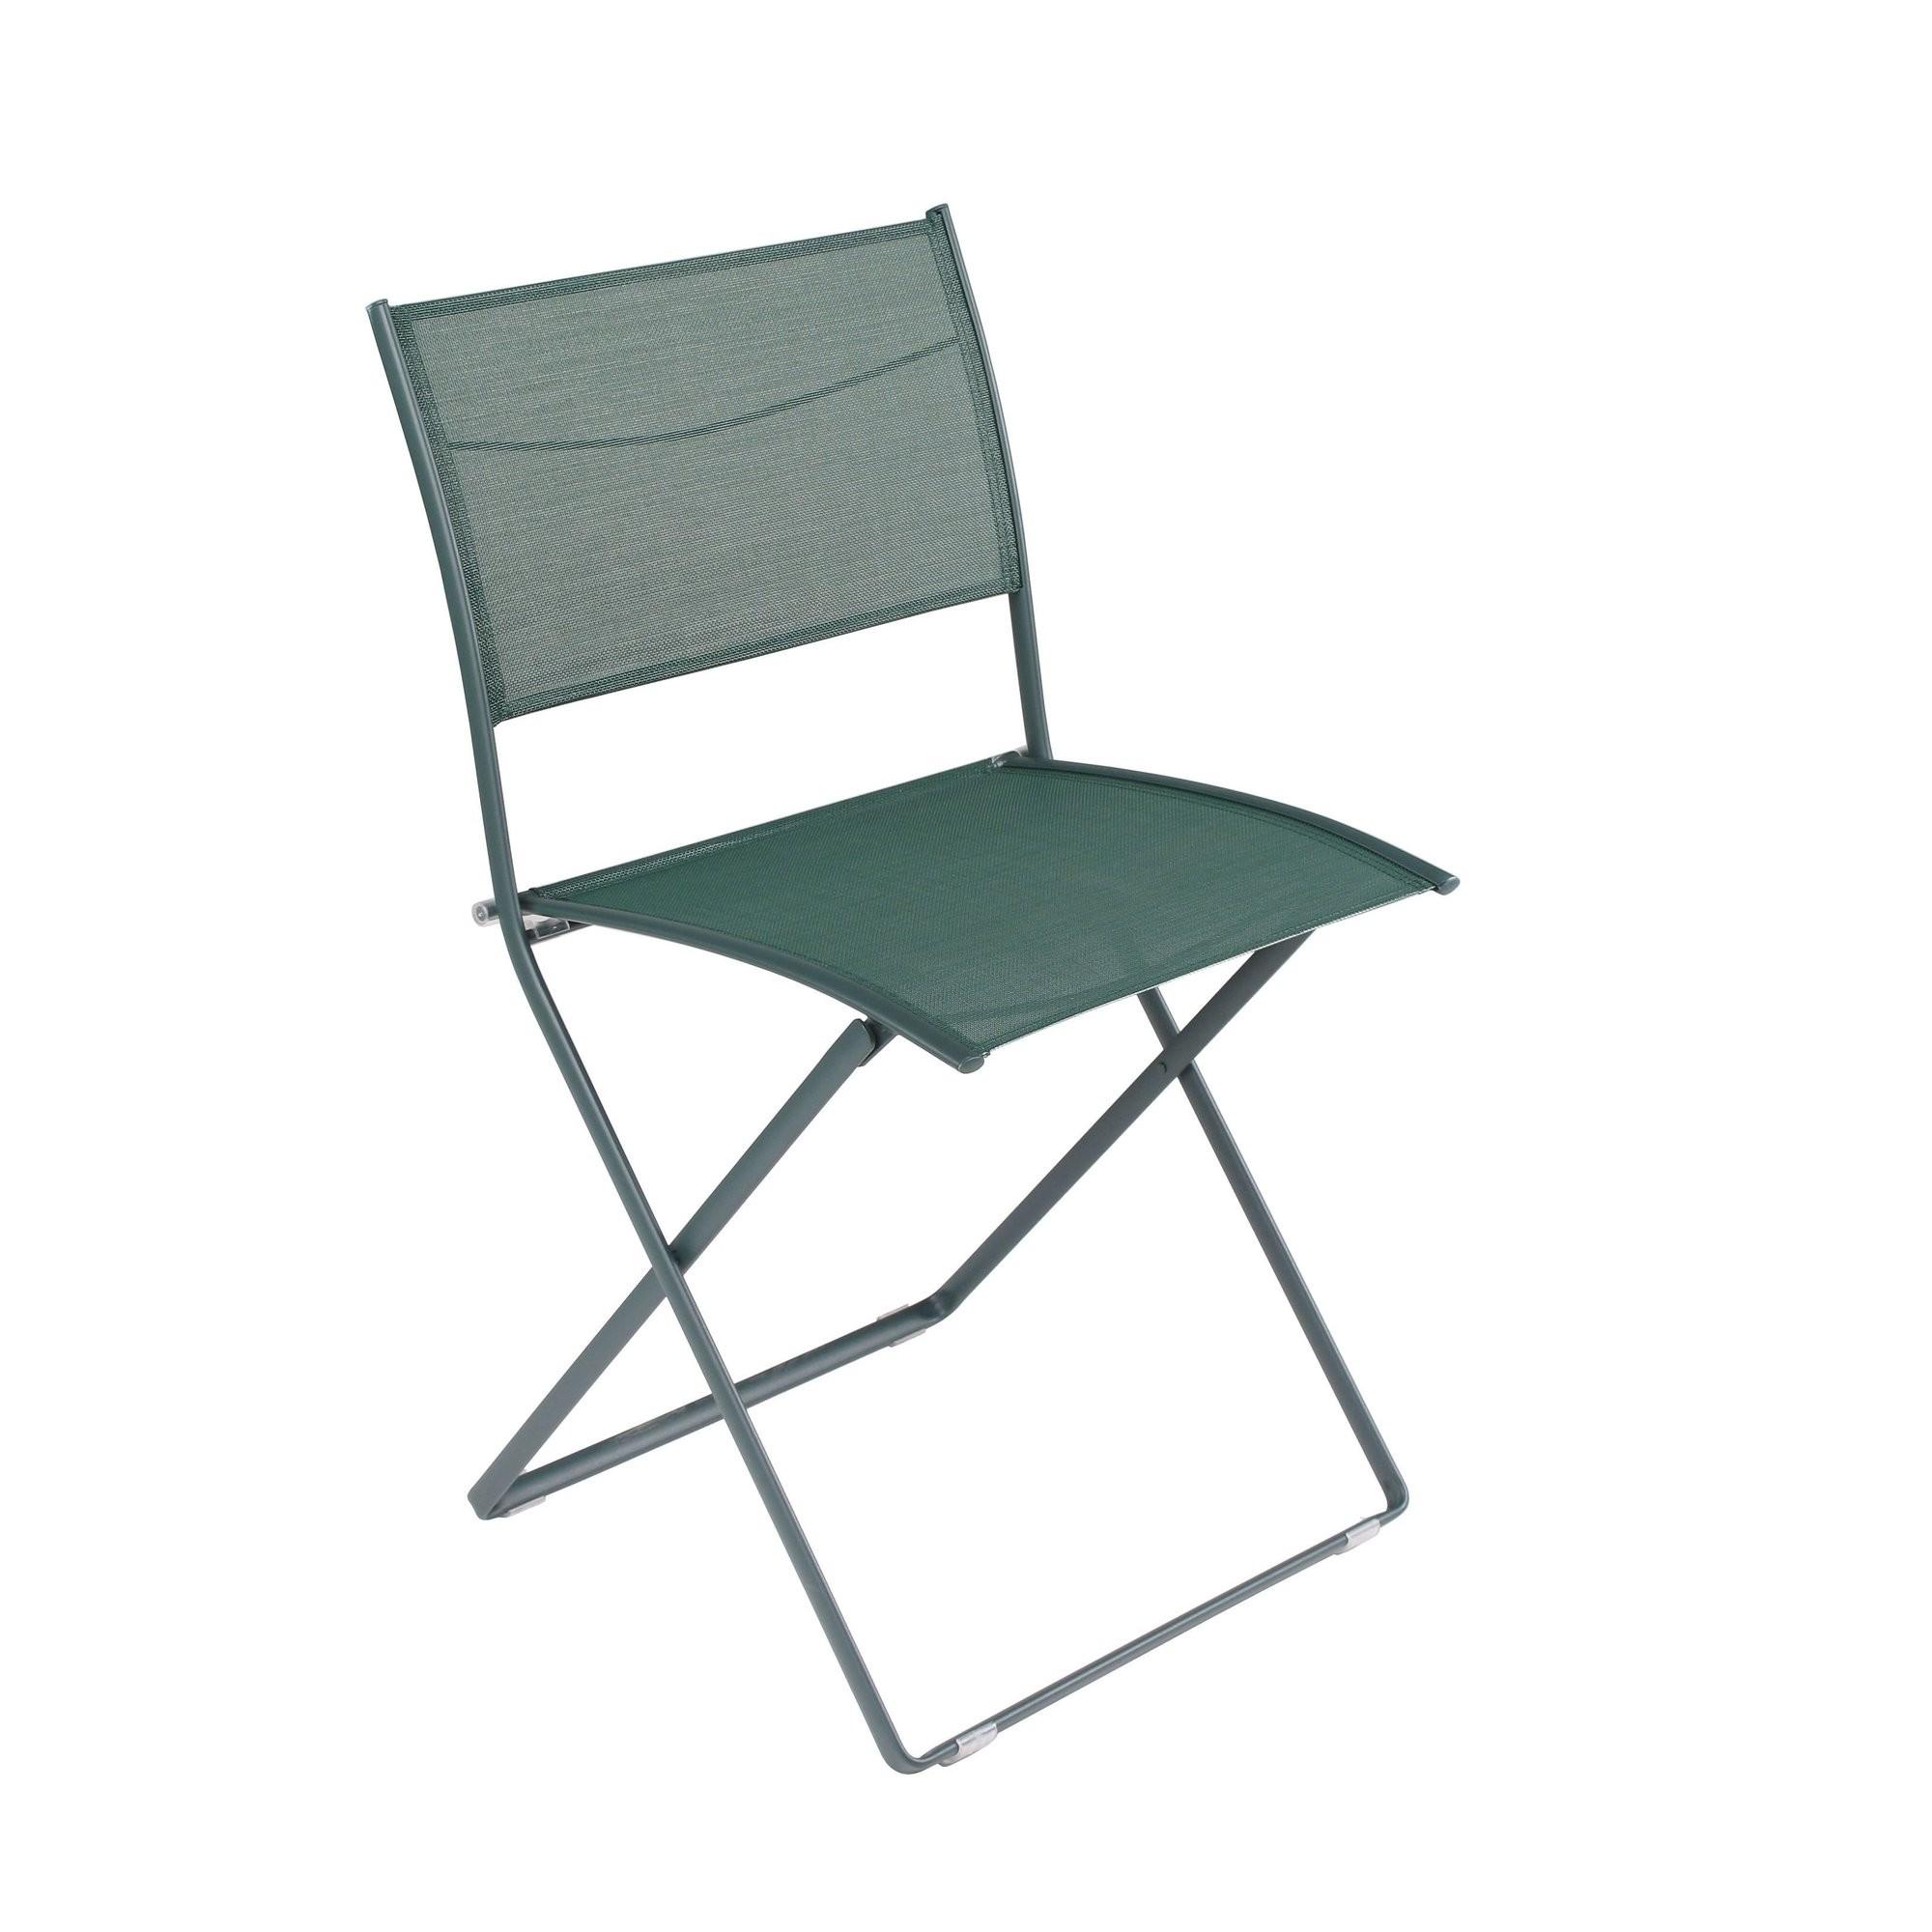 chaise pliante plein air de fermob c dre. Black Bedroom Furniture Sets. Home Design Ideas